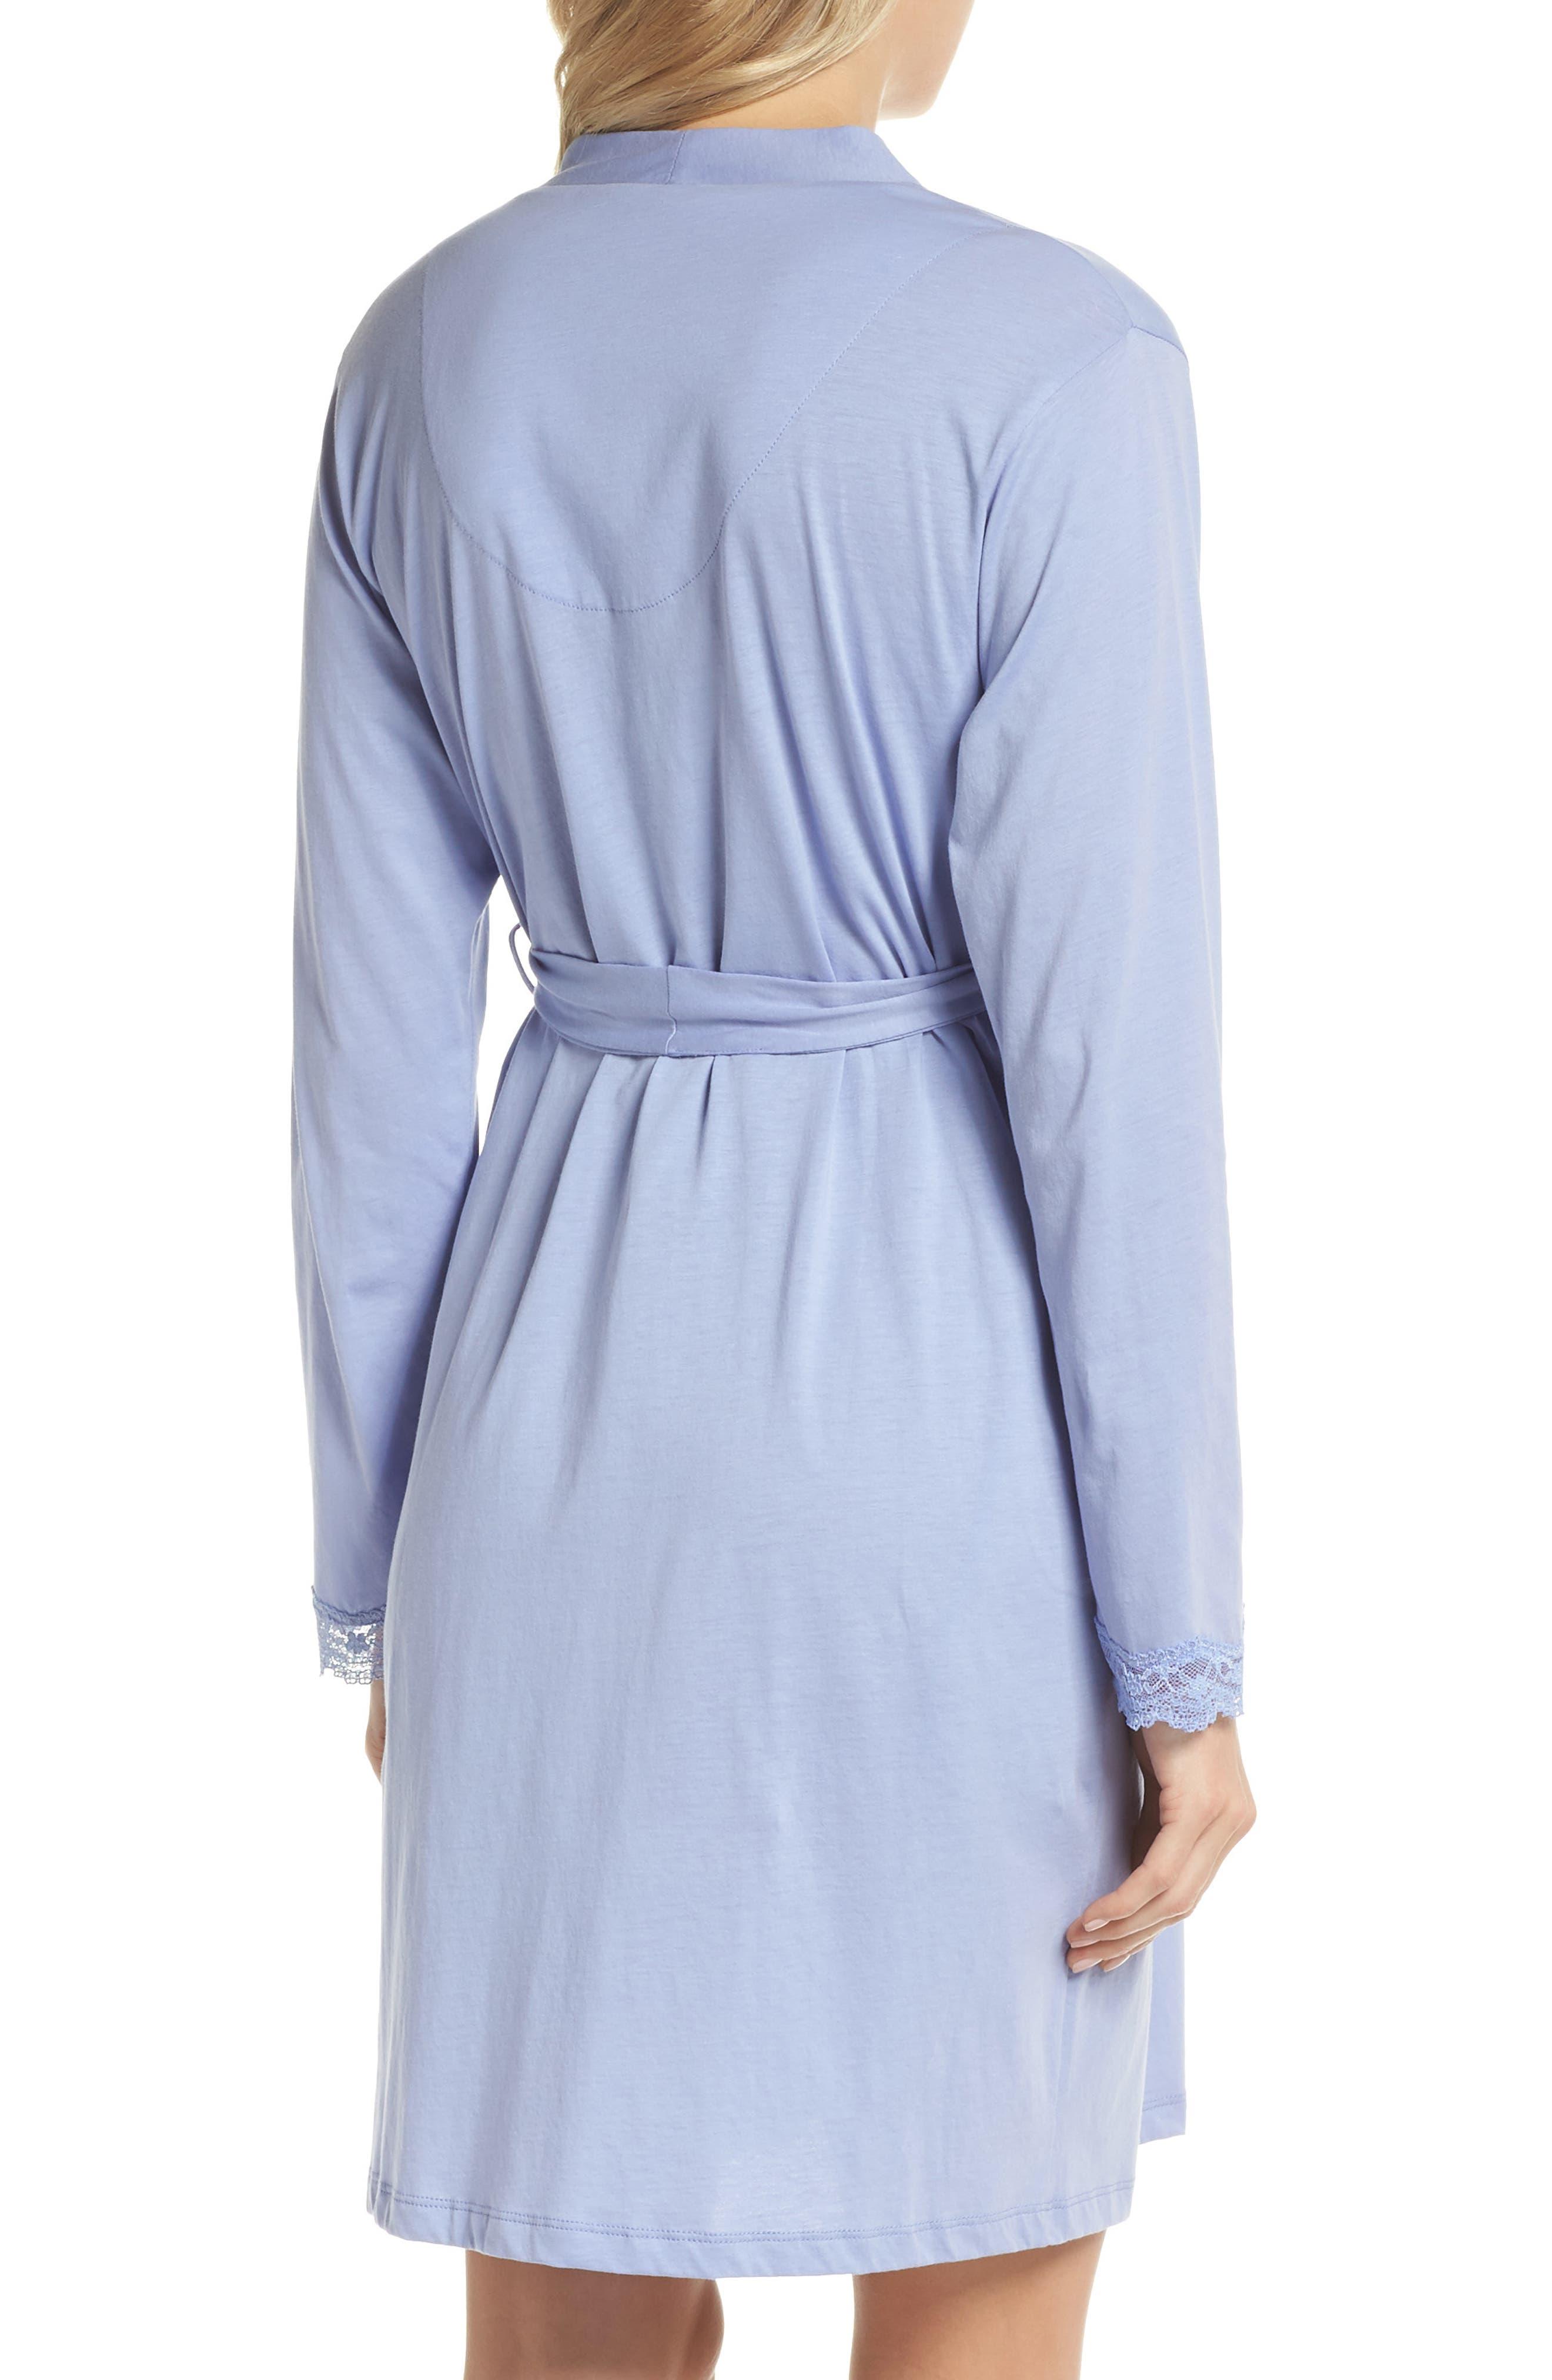 Alternate Image 2  - Belabumbum Violette Maternity/Nursing Robe